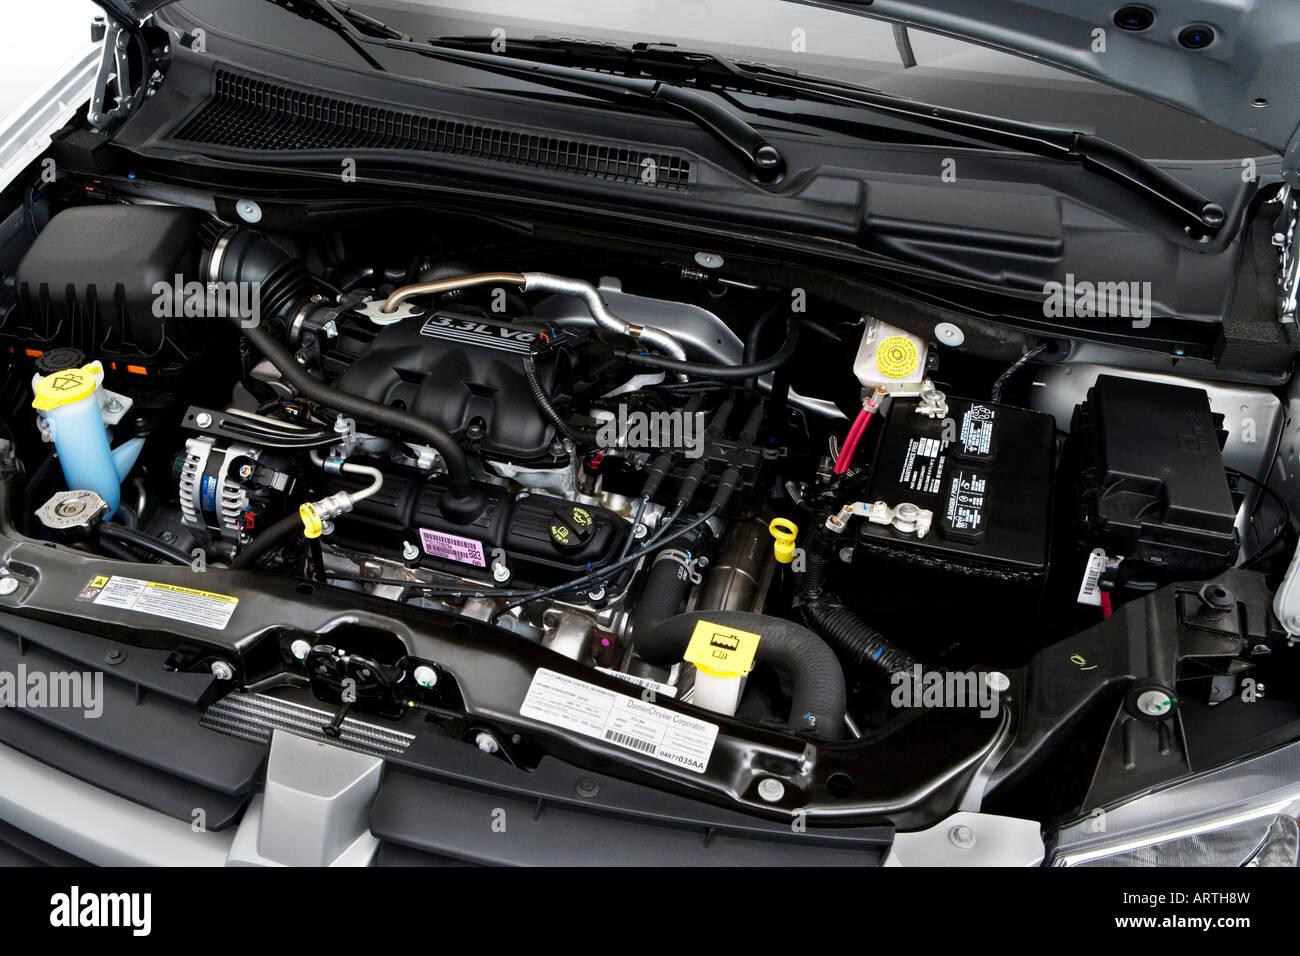 2008 Dodge Grand Caravan Se In Silver Engine Stock Photo Alamy